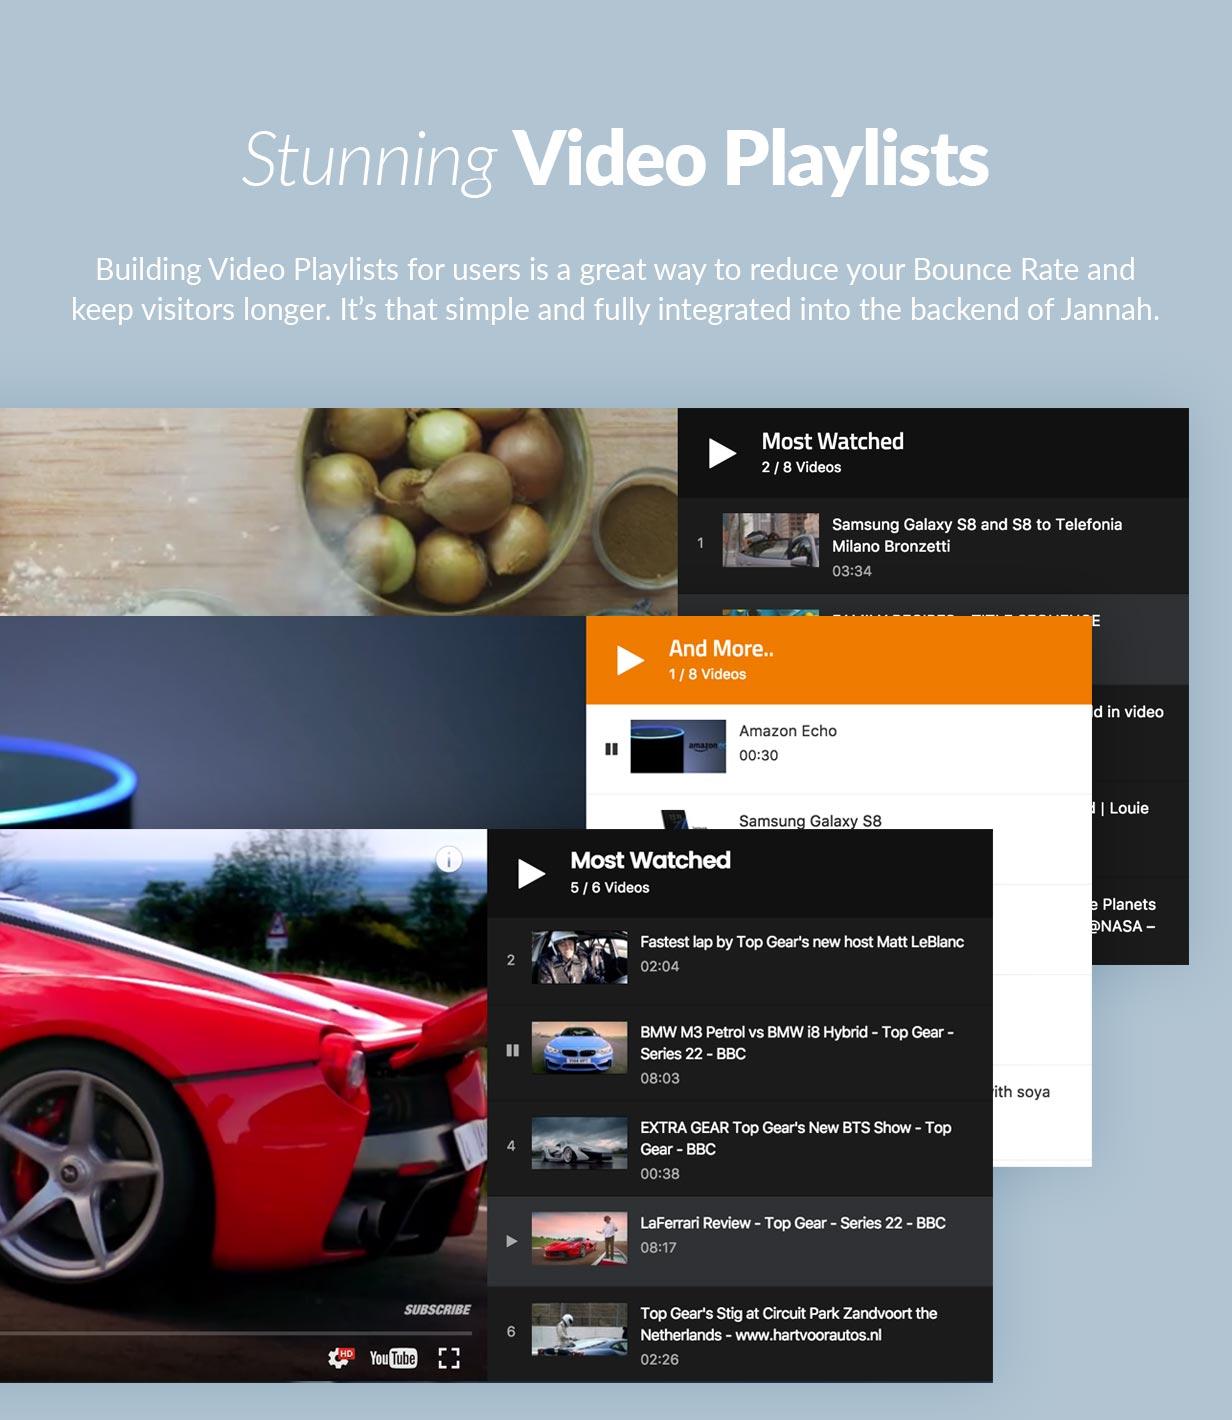 Stunning Video Playlists